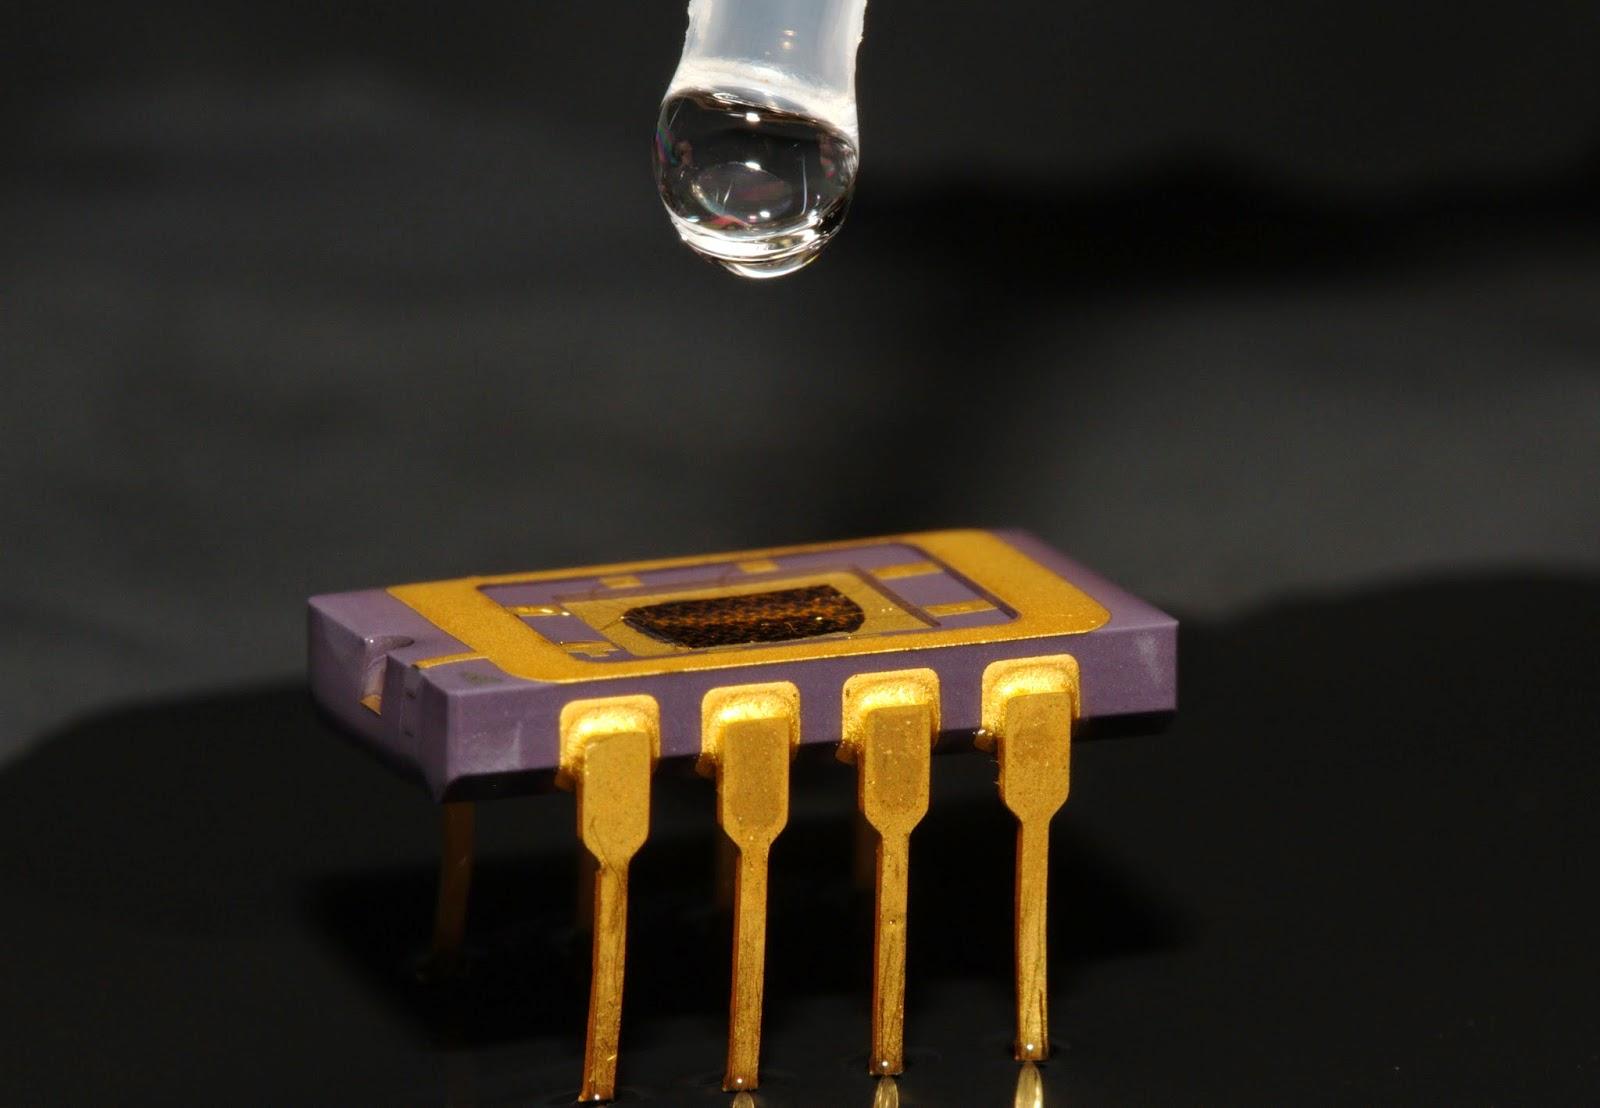 Chemical sensor chip